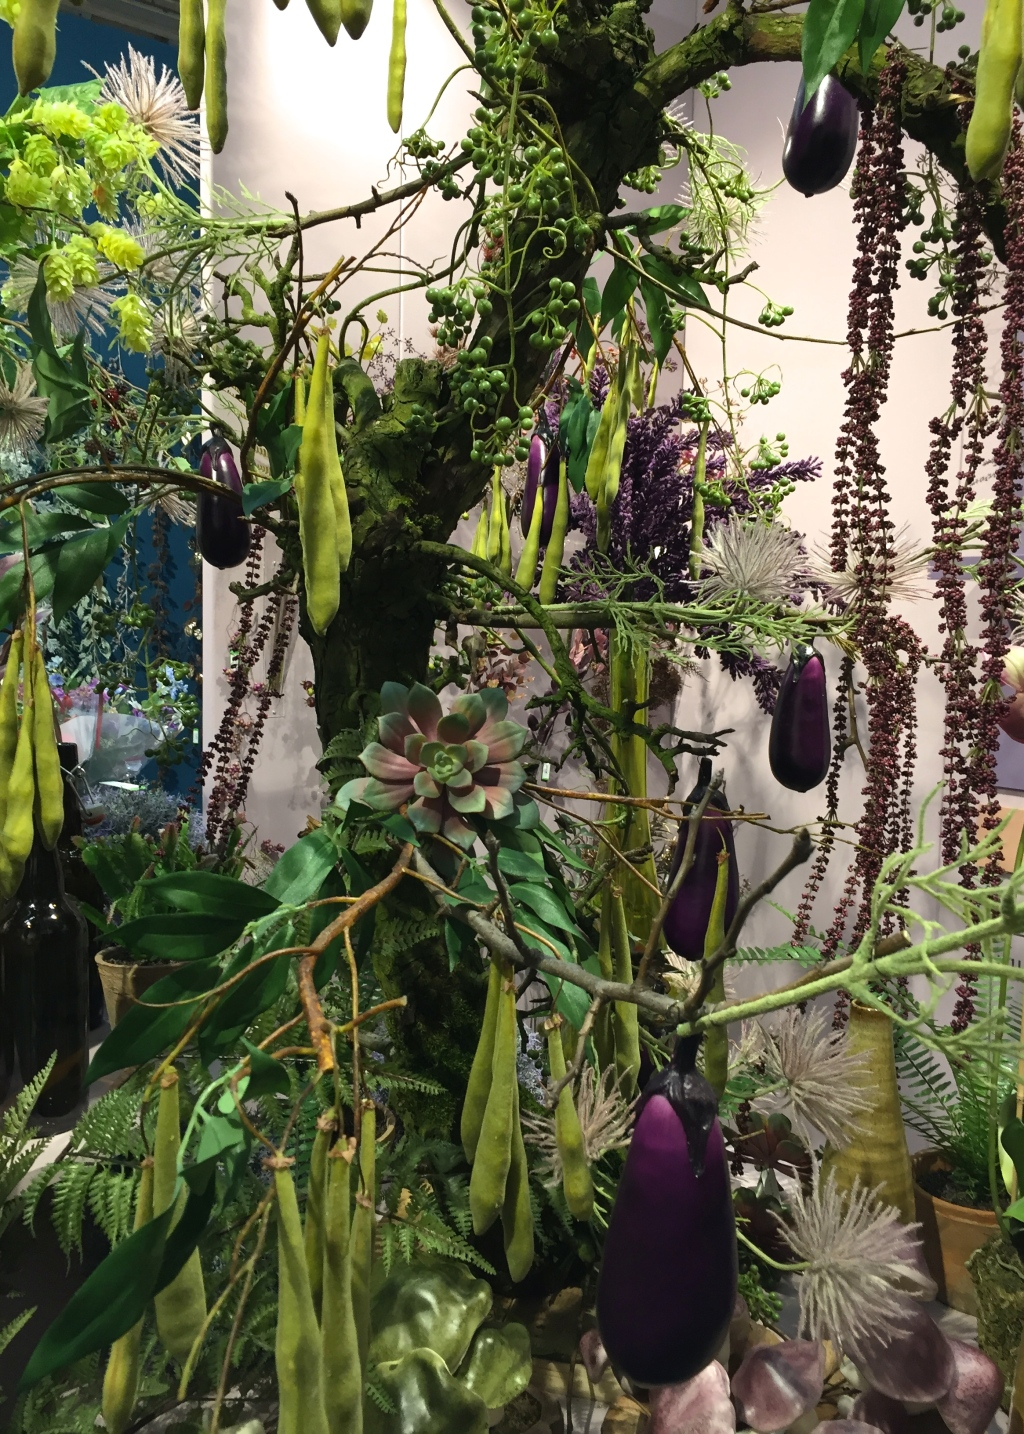 Arrangement of pods, fruits and foliage, Christmas World, January 2017